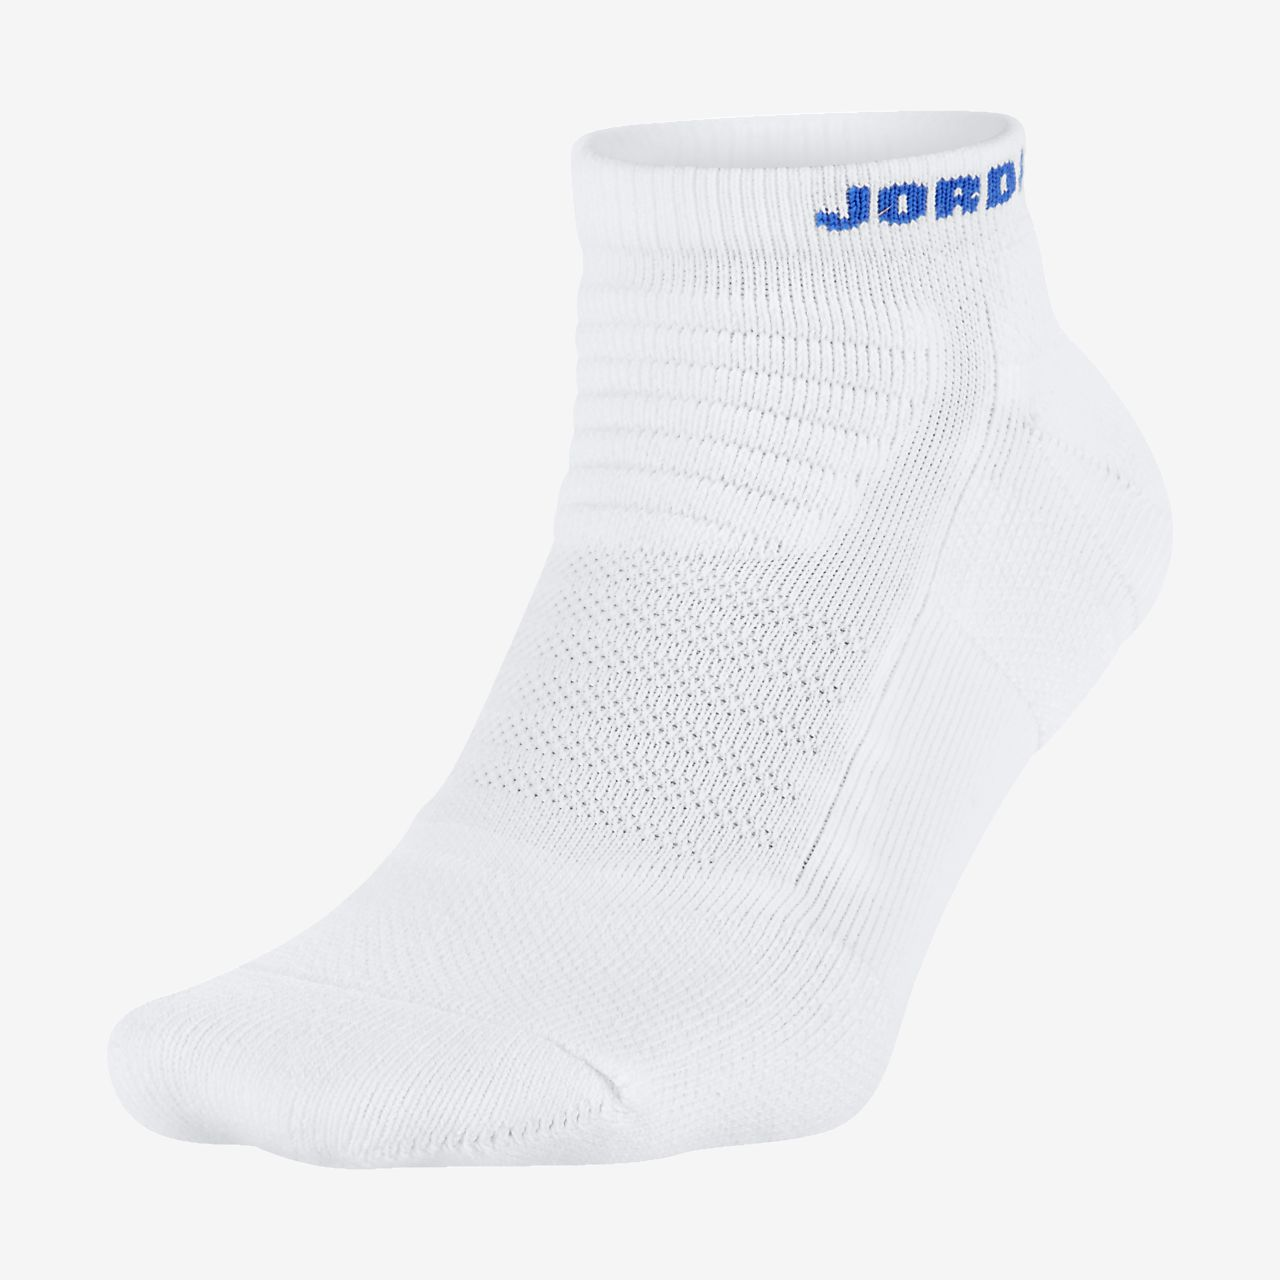 Calcetines de básquetbol Jordan Dry Flight 2.0 Ankle